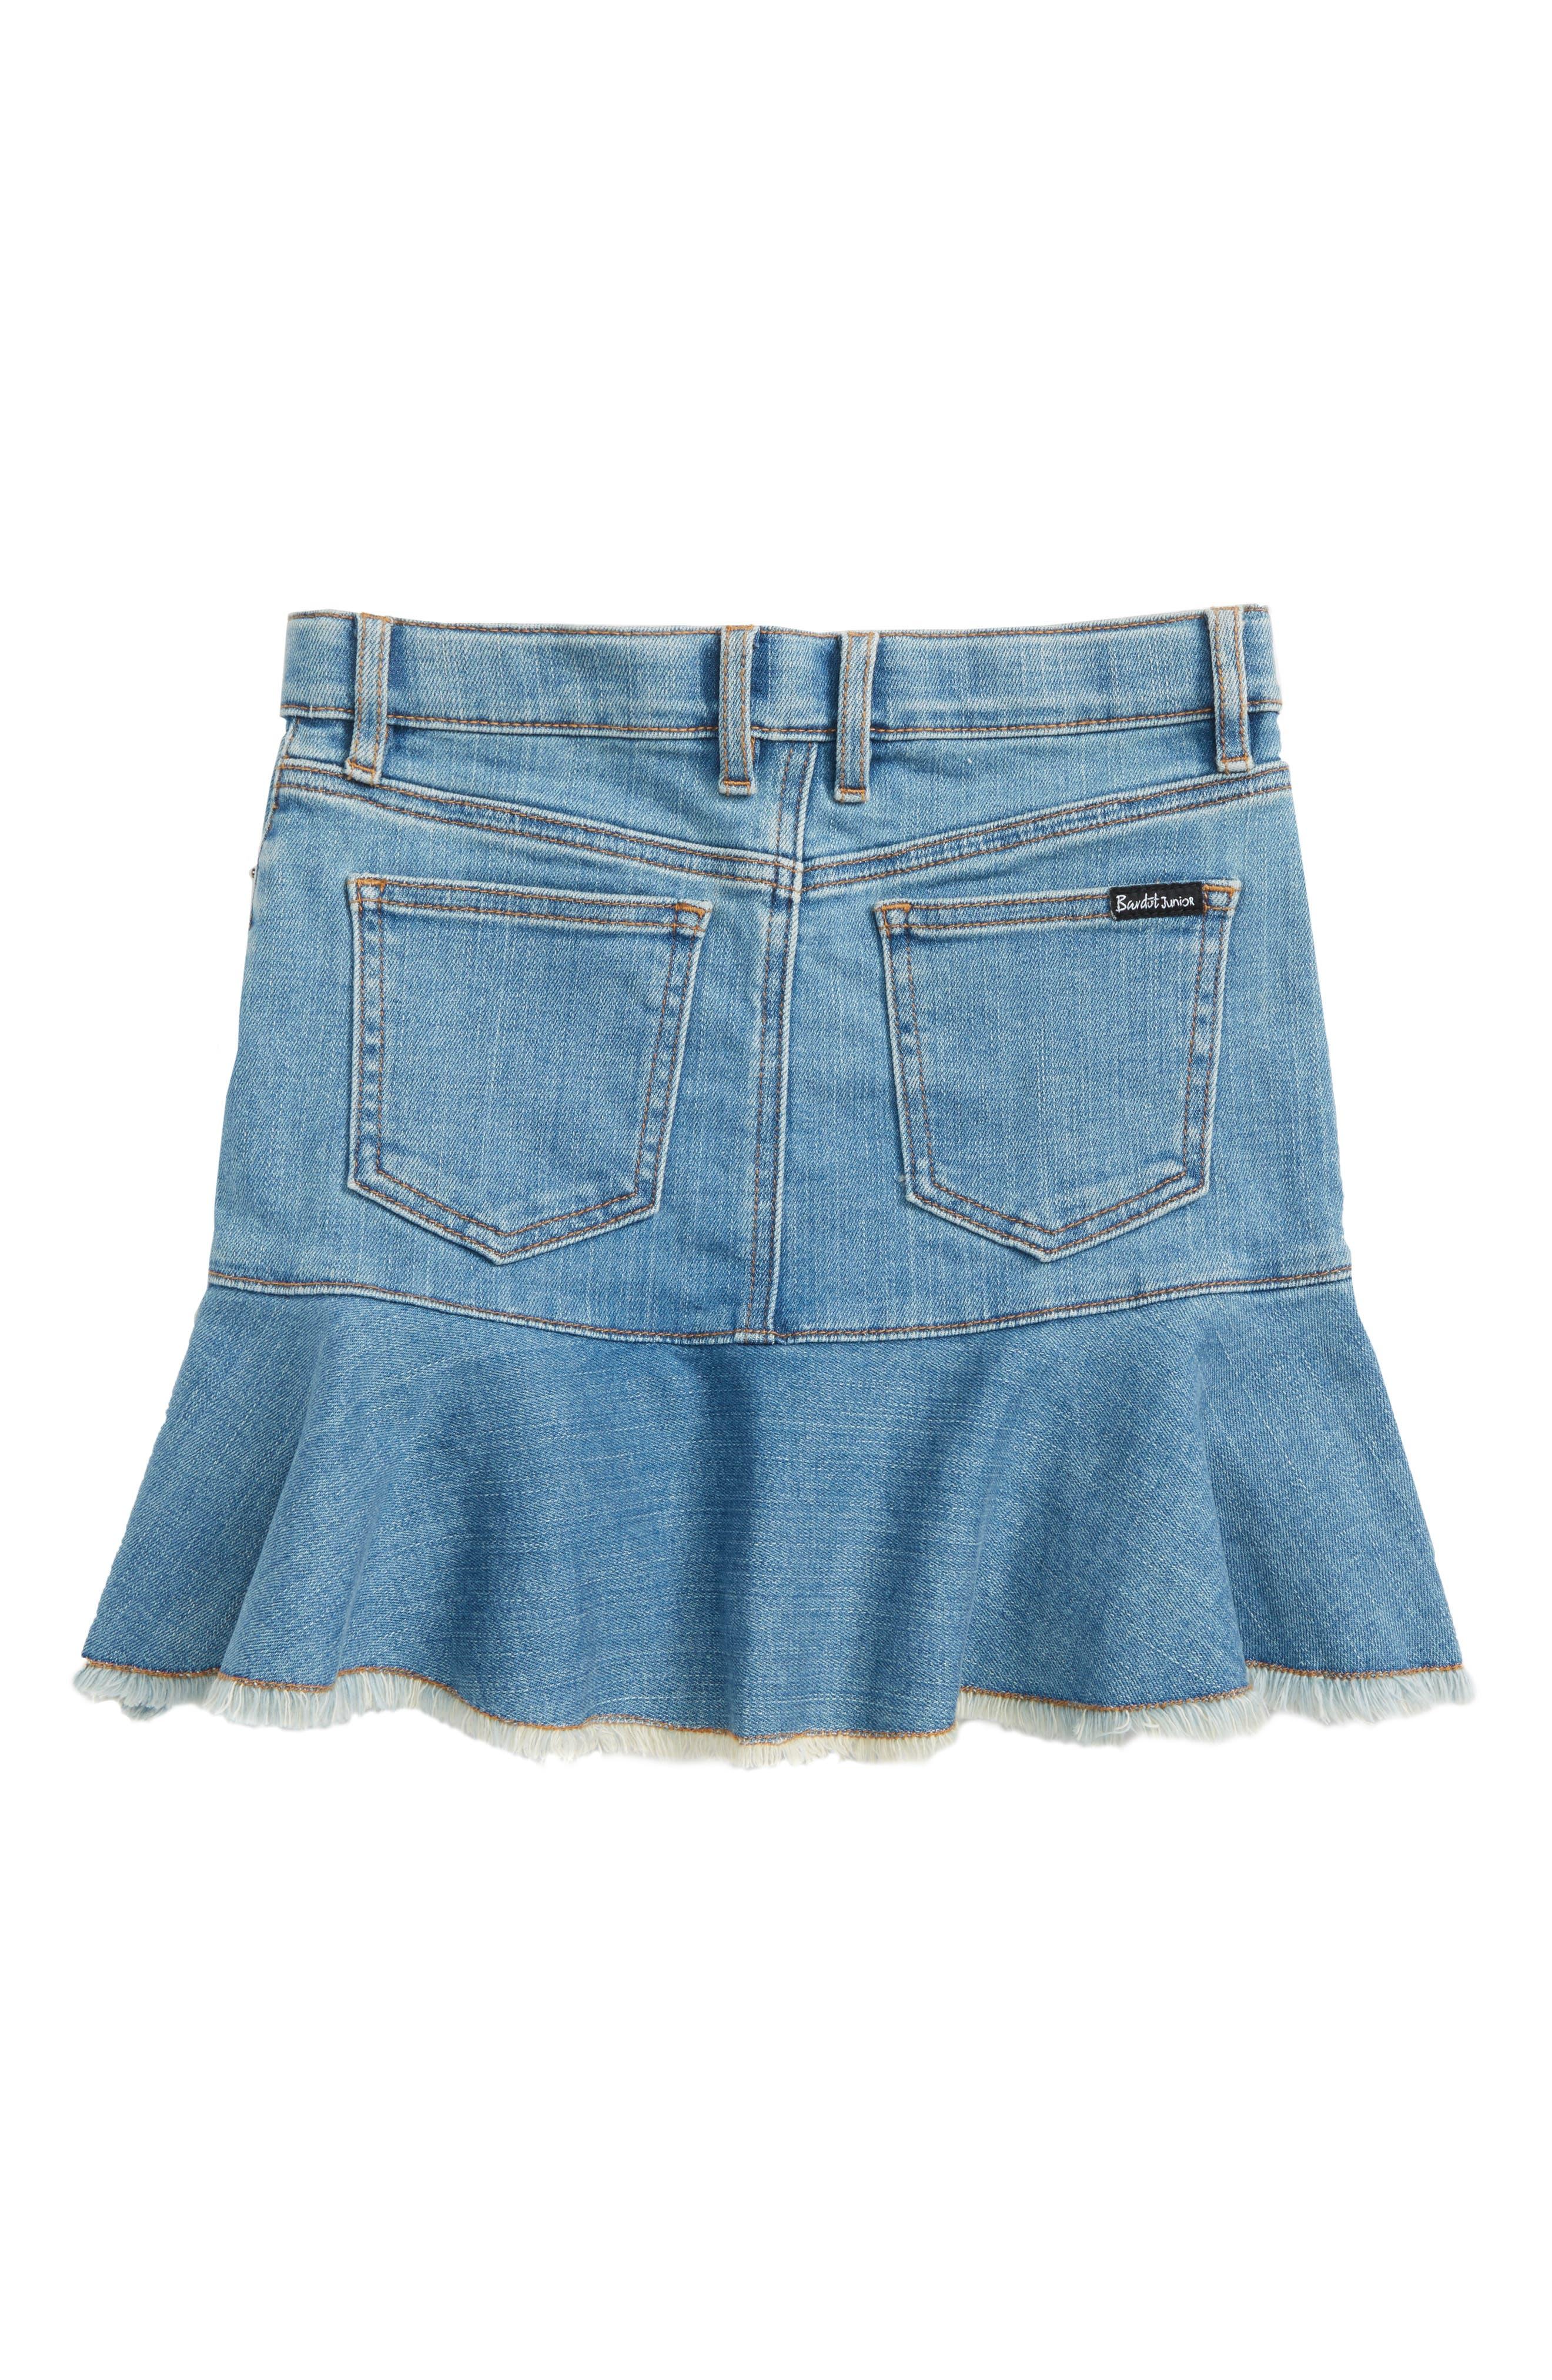 Mia Denim Skirt,                             Alternate thumbnail 2, color,                             428